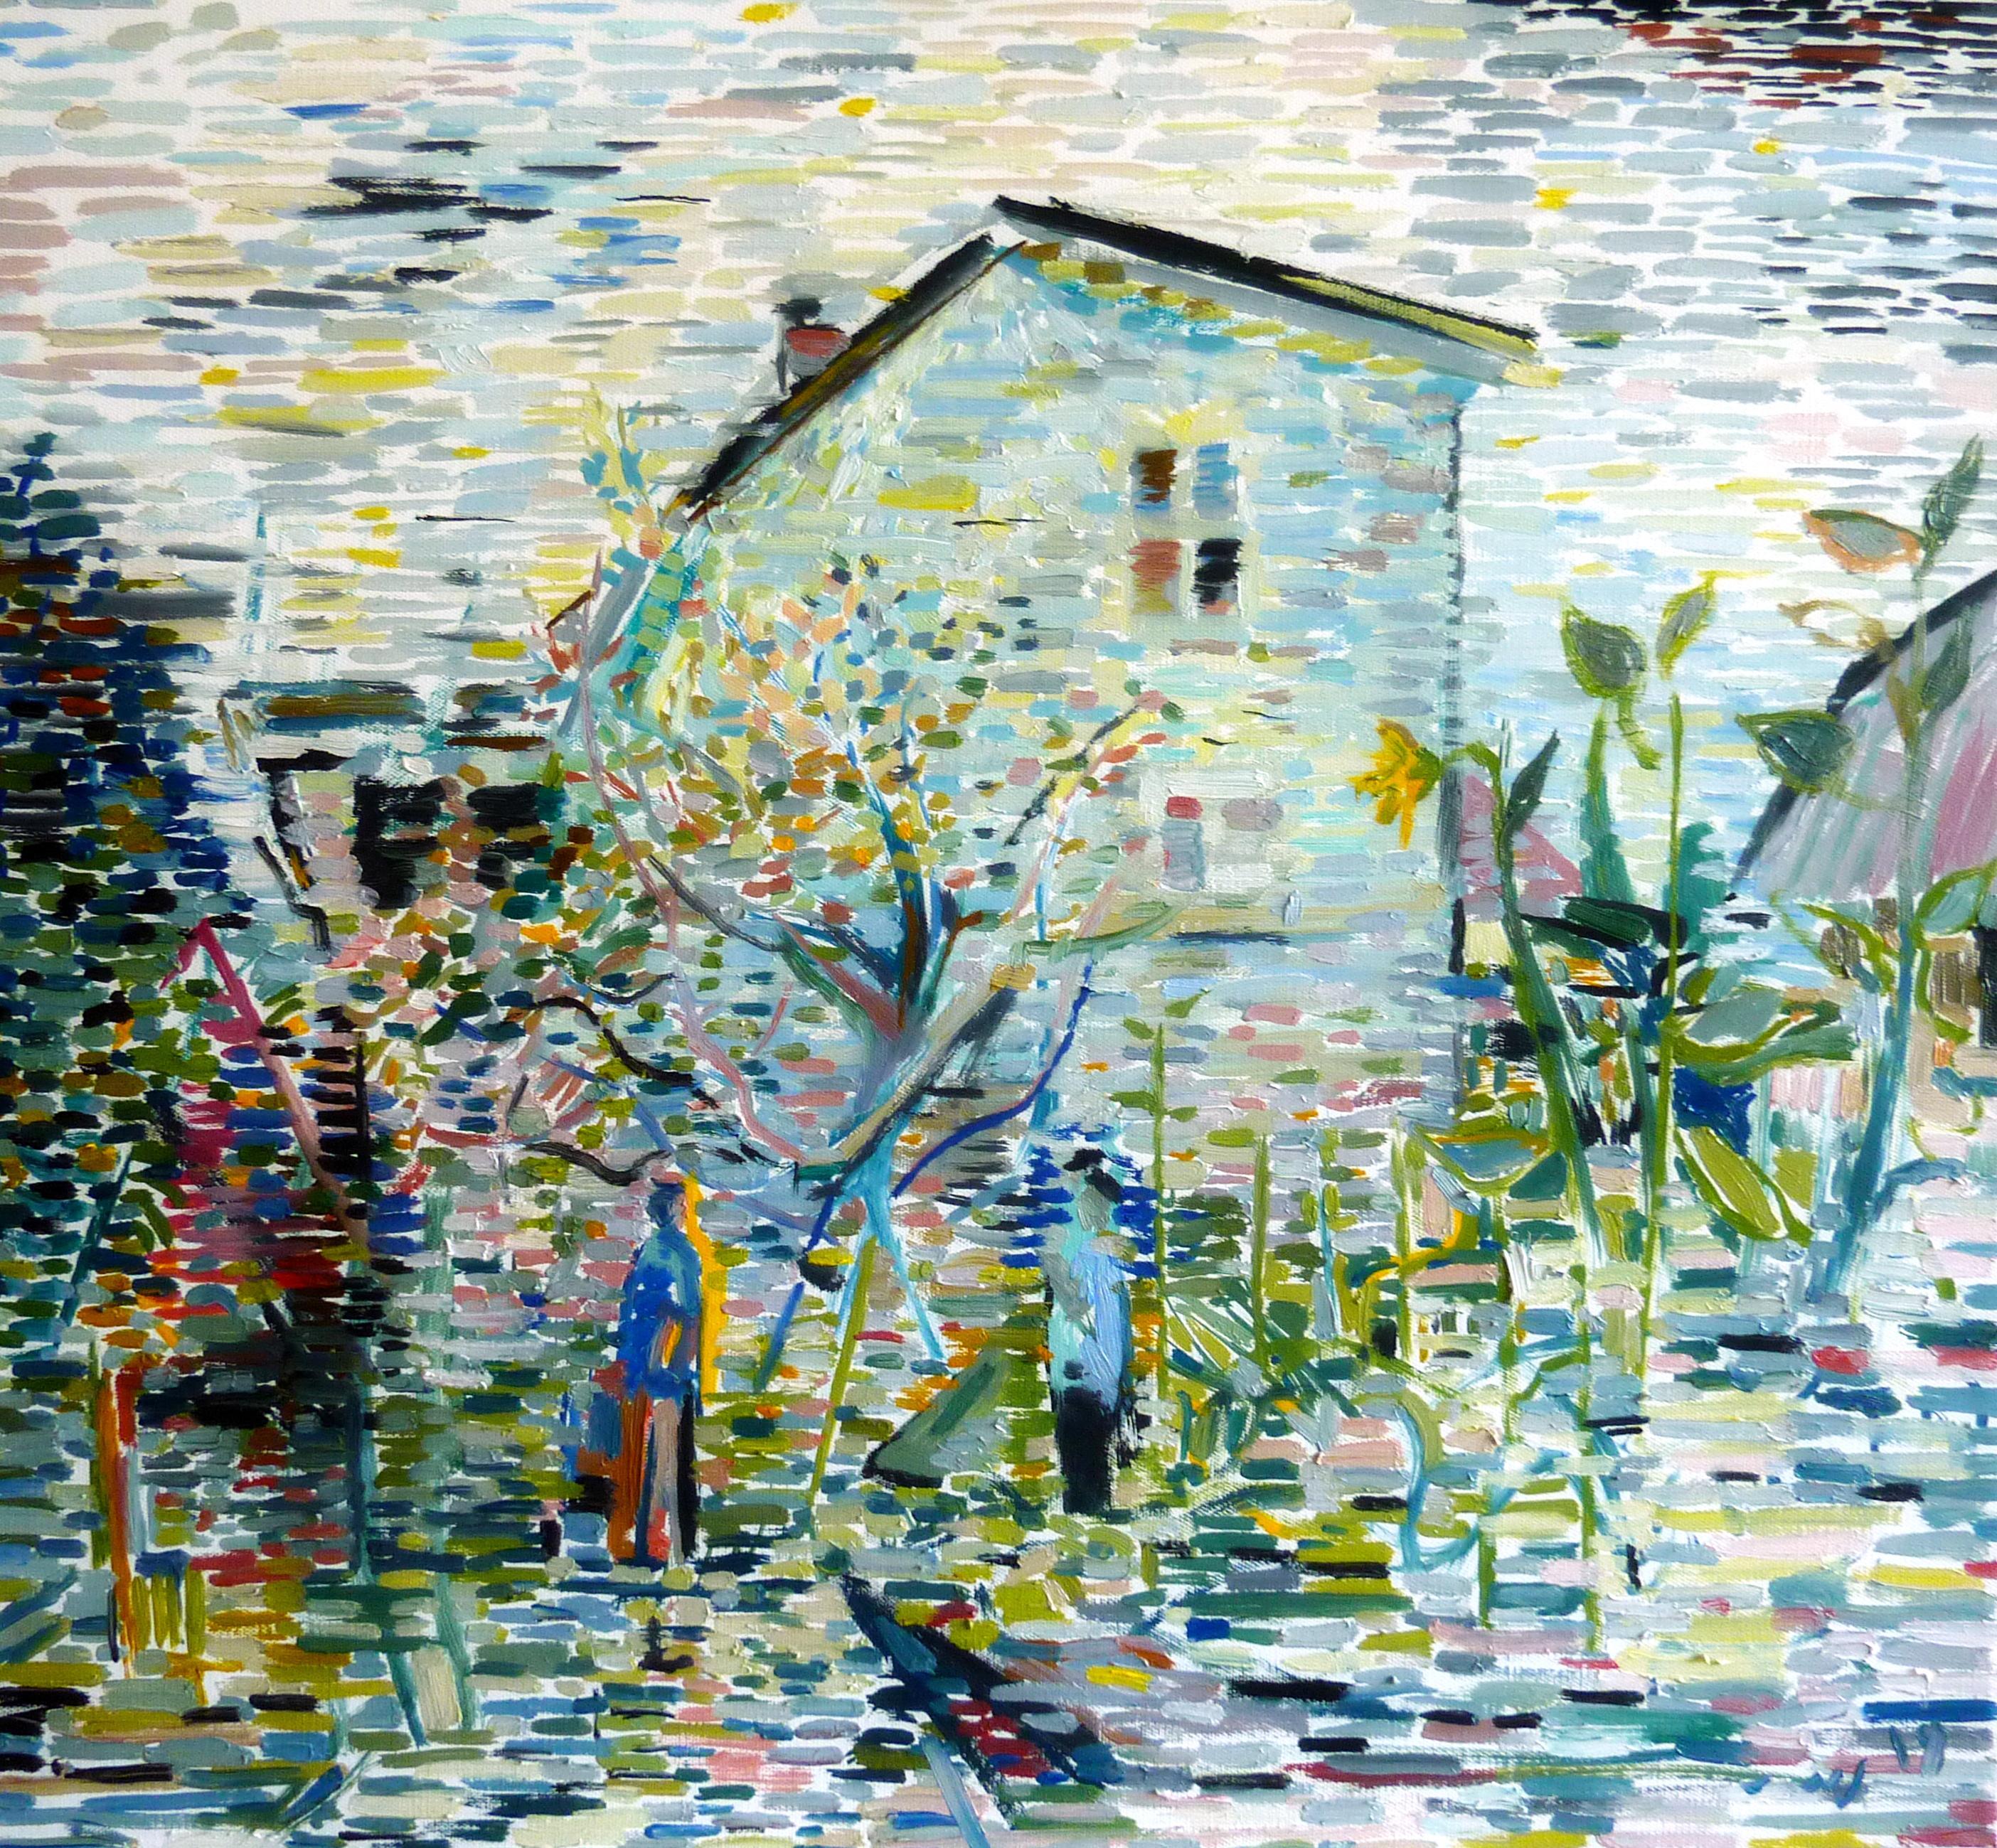 Gray Garden - 21st Century Contemporary Pointillism Nature Oil Painting